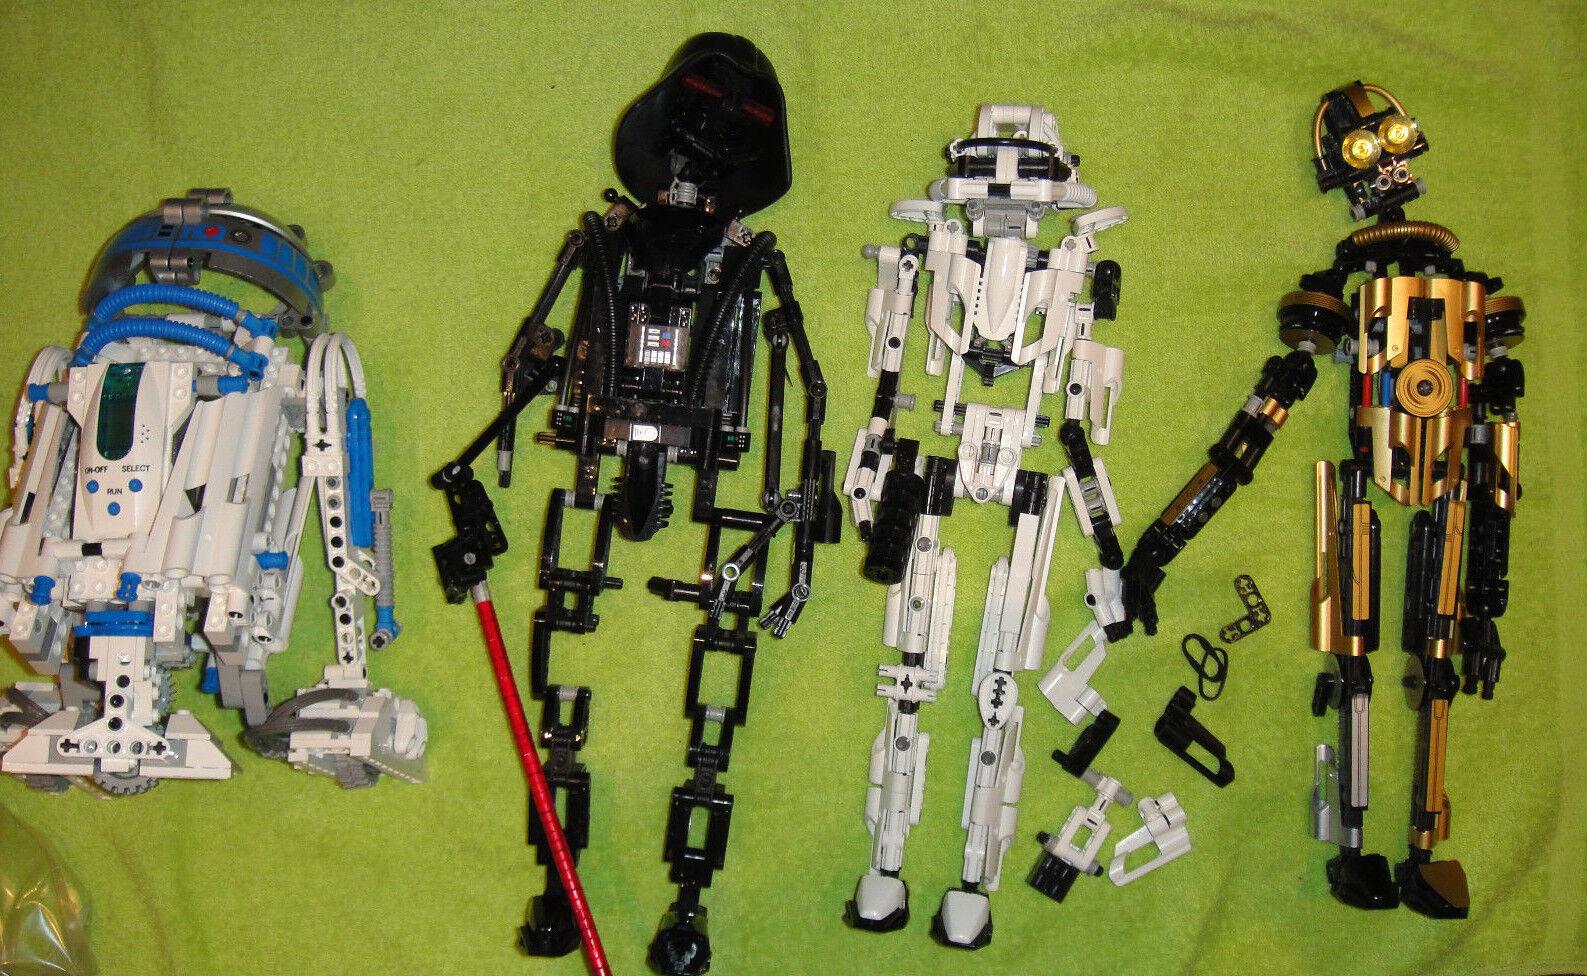 Lego Star Wars R2D2 8009 Darth Vader 8010 Storm Trooper 8008 8007 C-3PO Konvolut